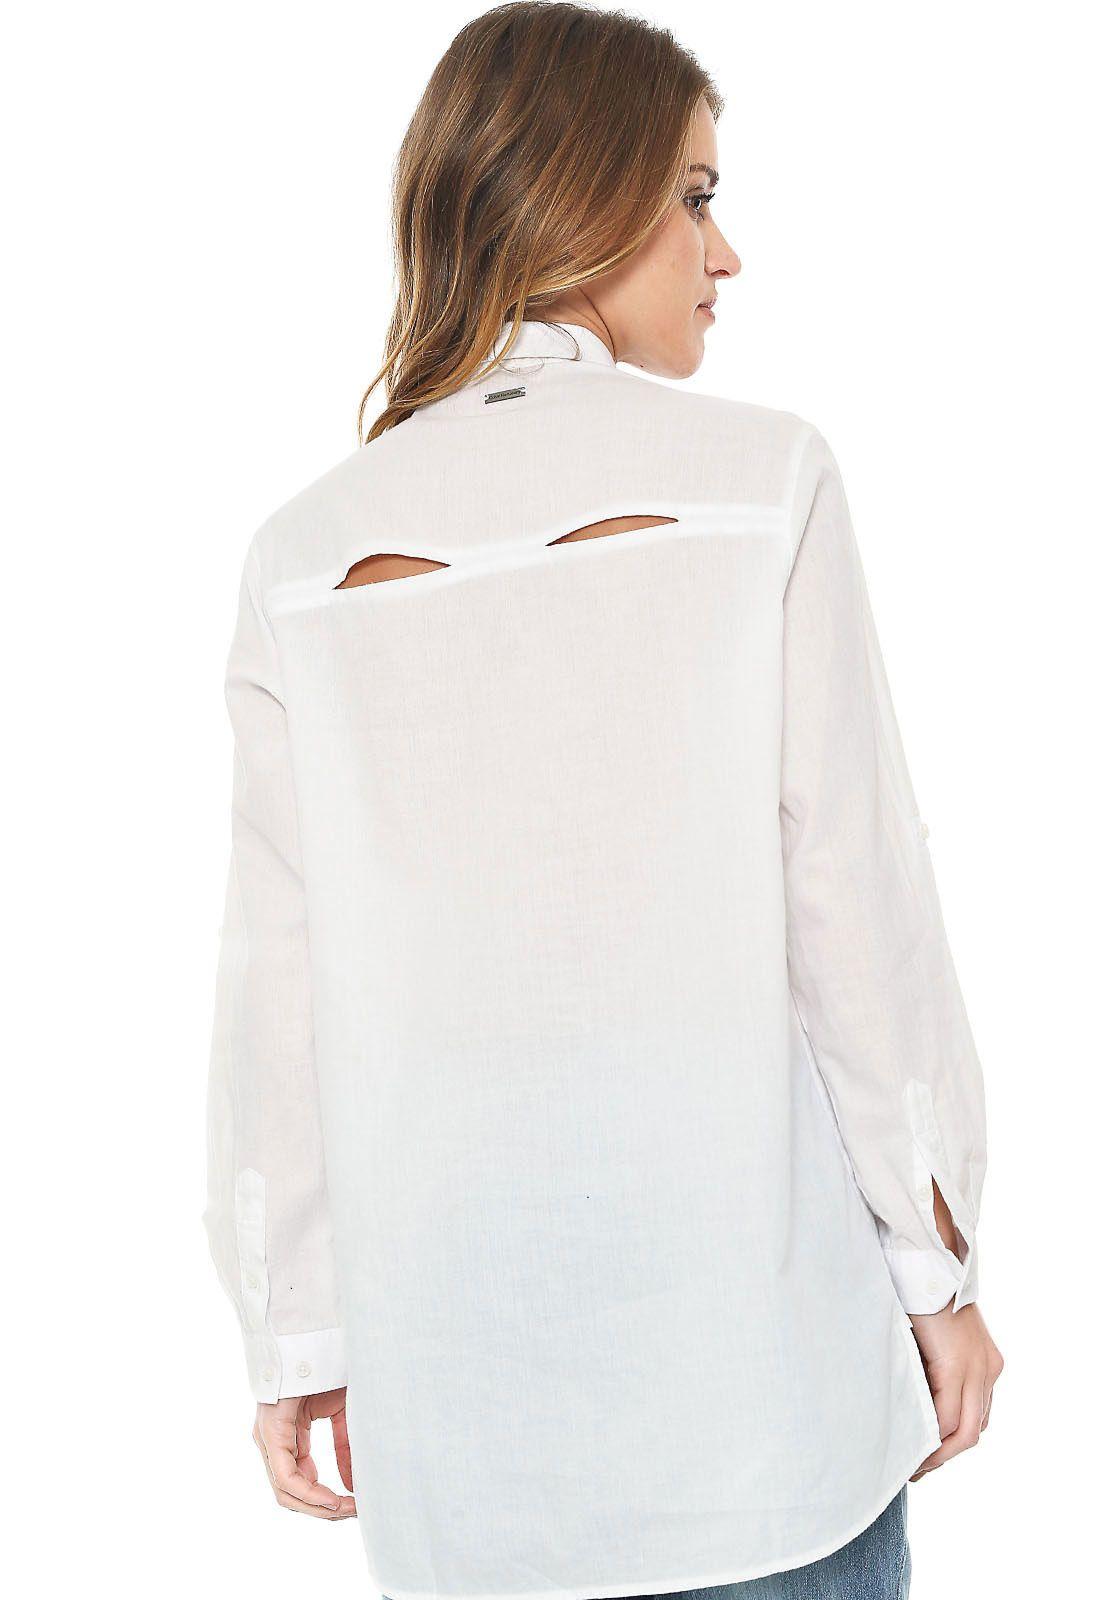 af26bb617b Camisa Calvin Klein Jeans Bolsos Branca